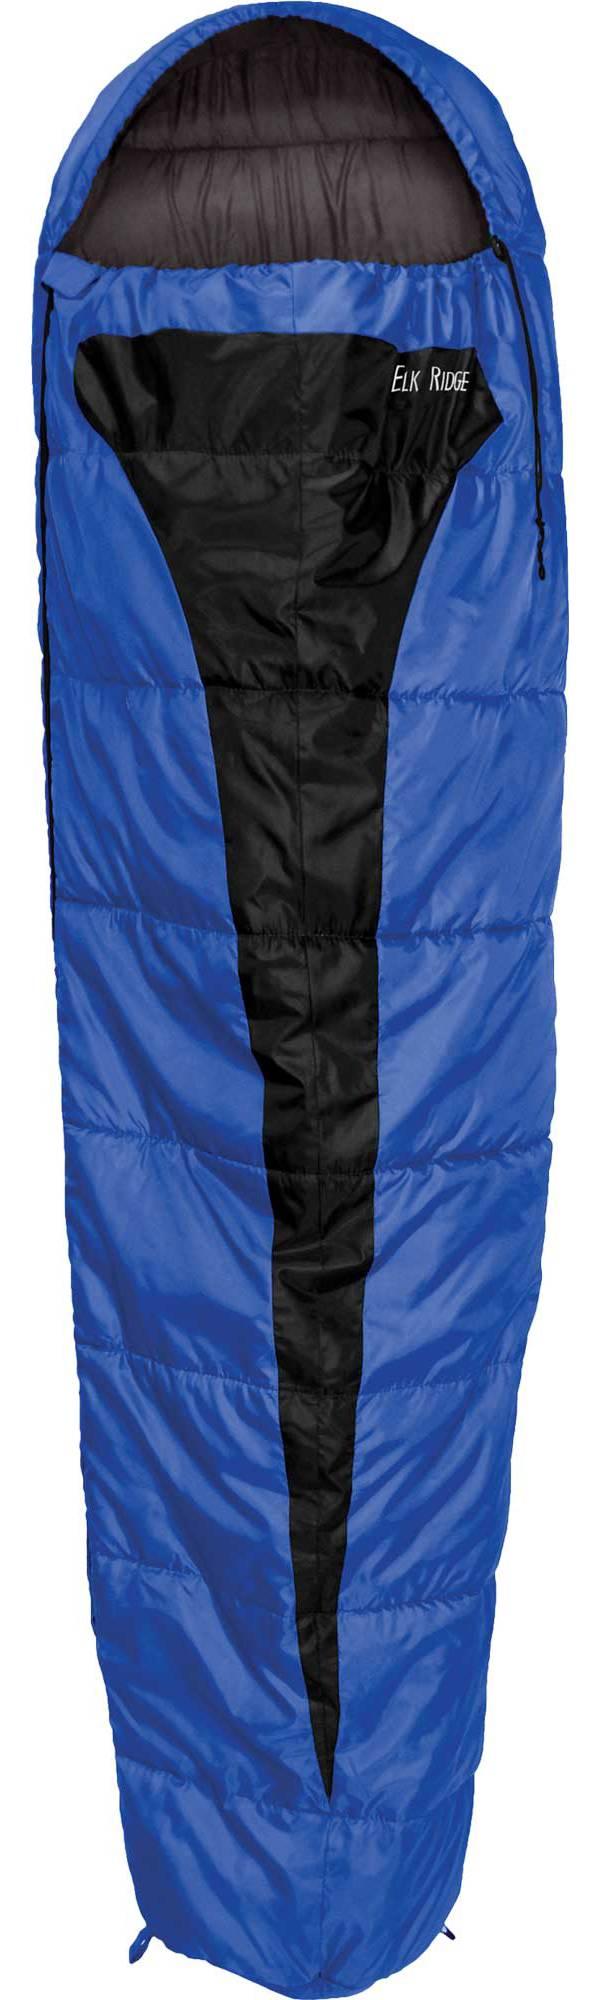 Texsport Elk Ridge 30° Sleeping Bag product image